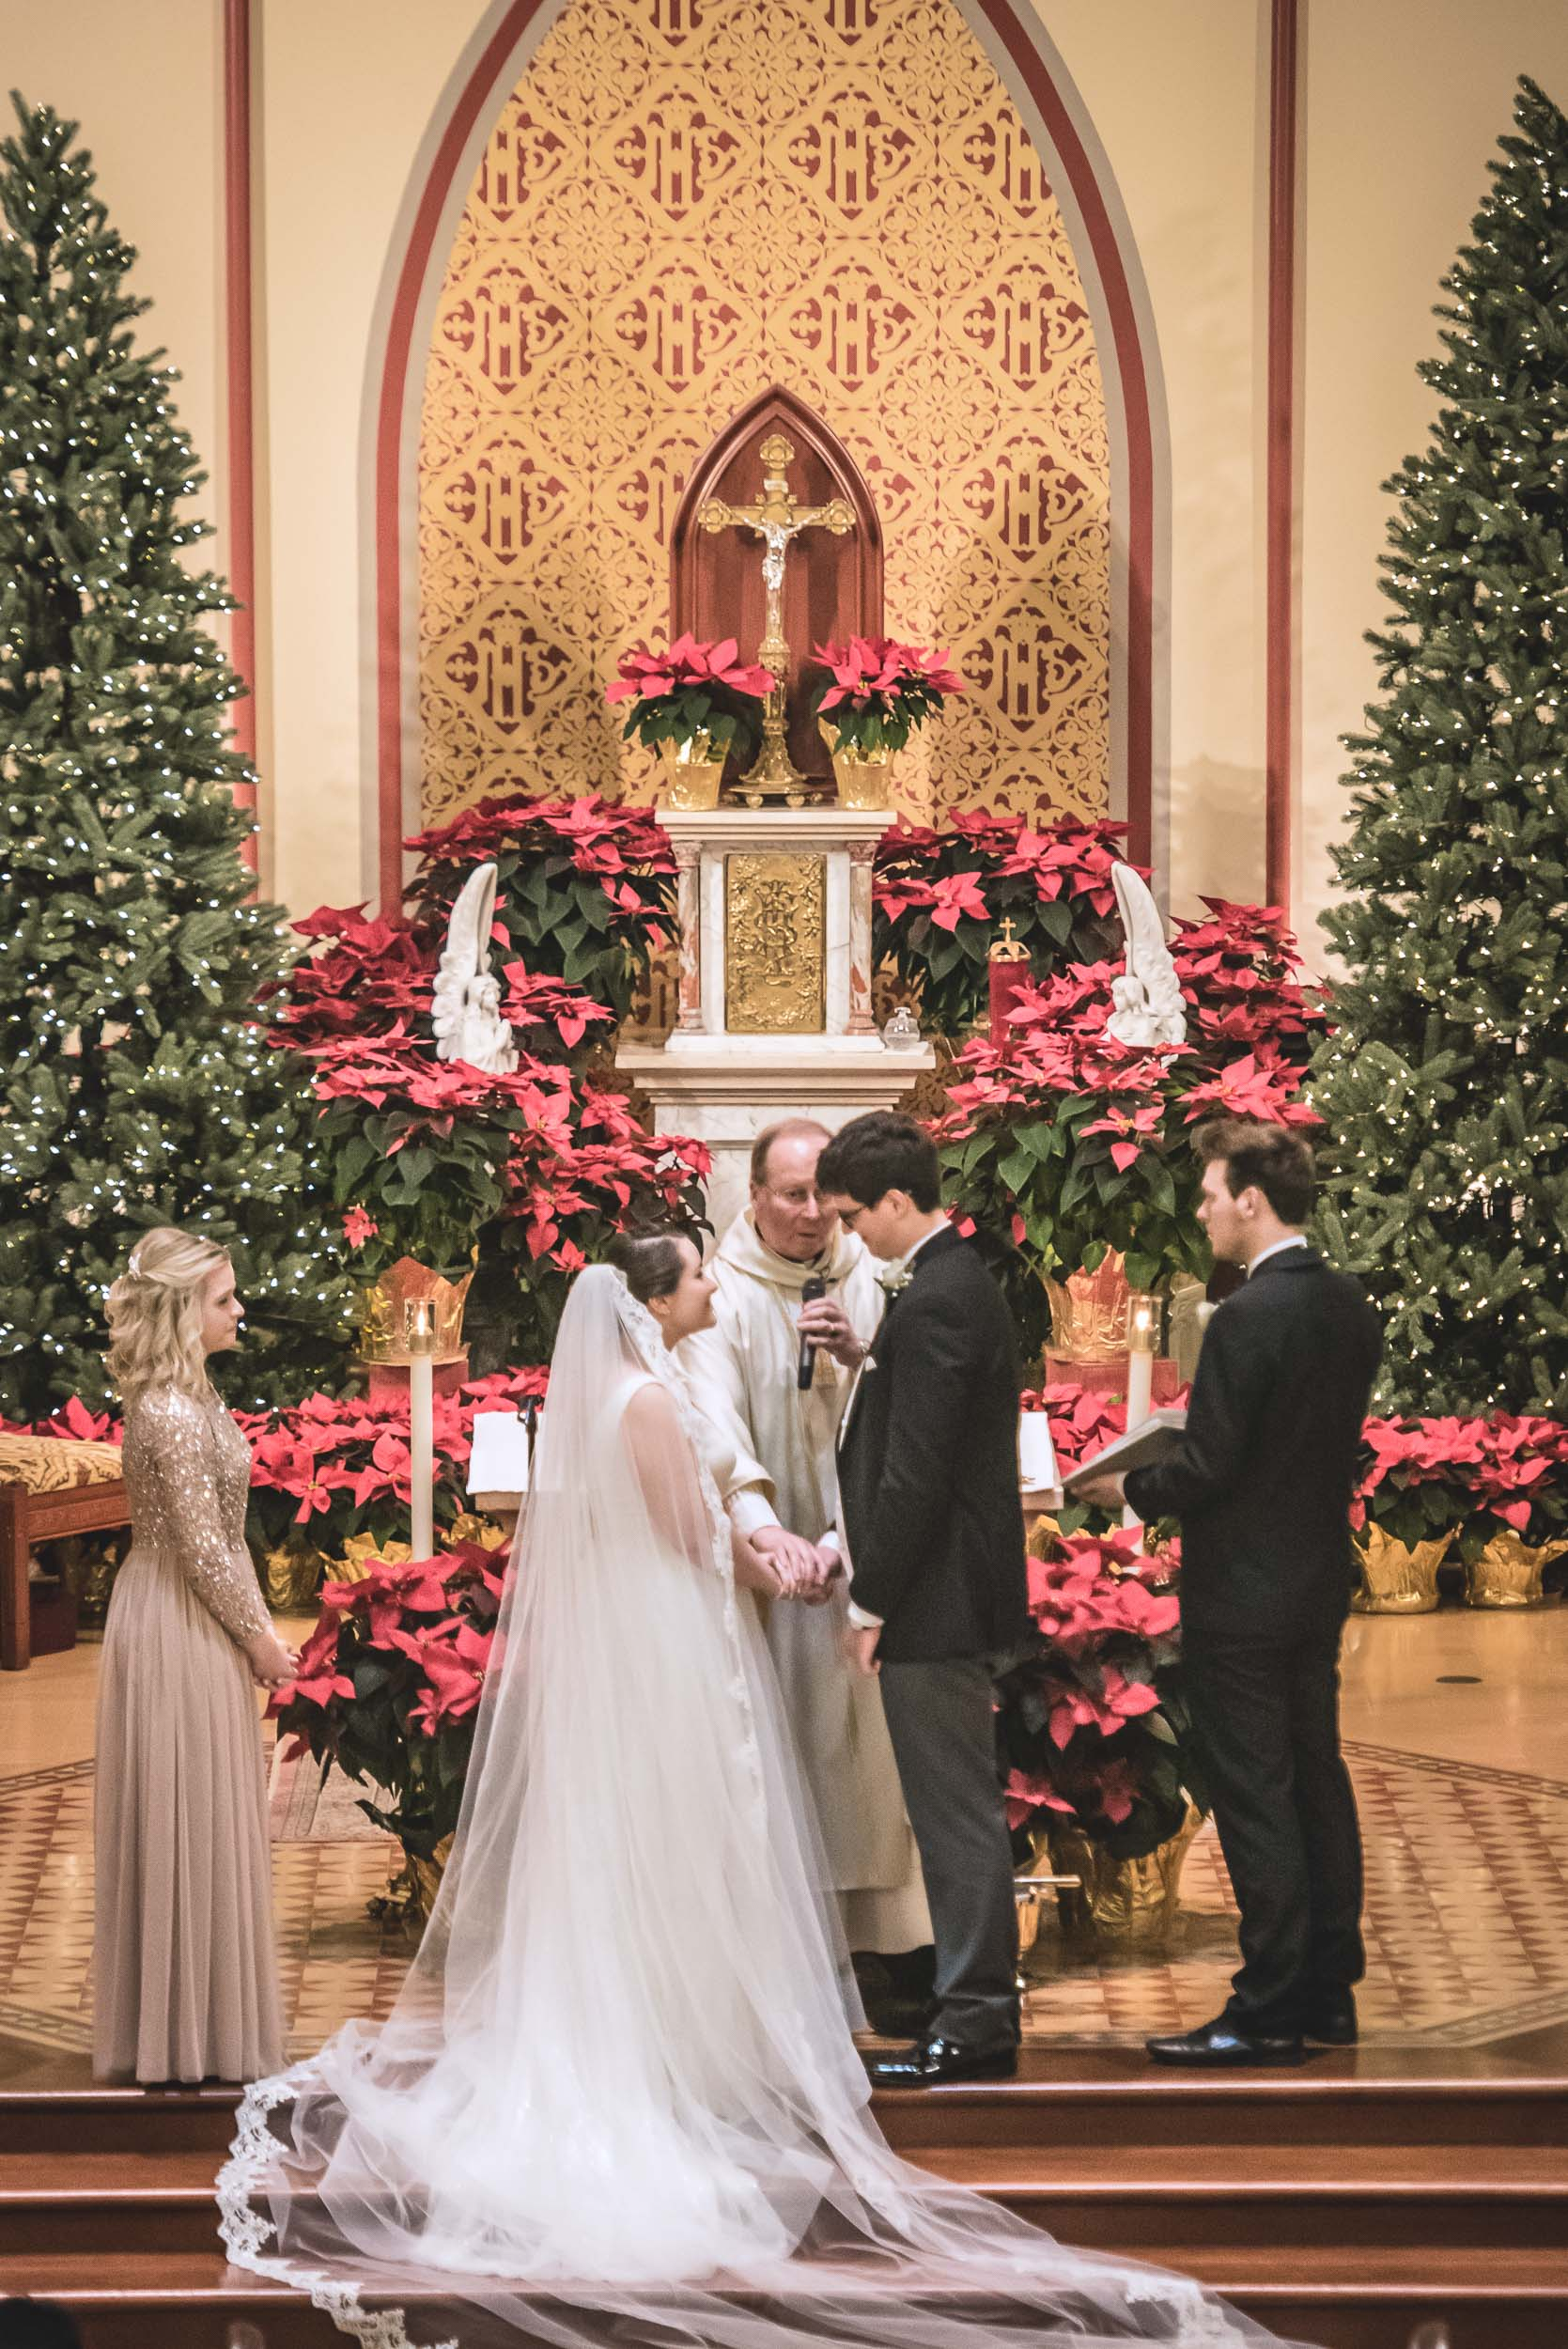 katie_mathia_wedding_Church_assumption_madison_hotel_morristown_new_jersey(3of2).jpg